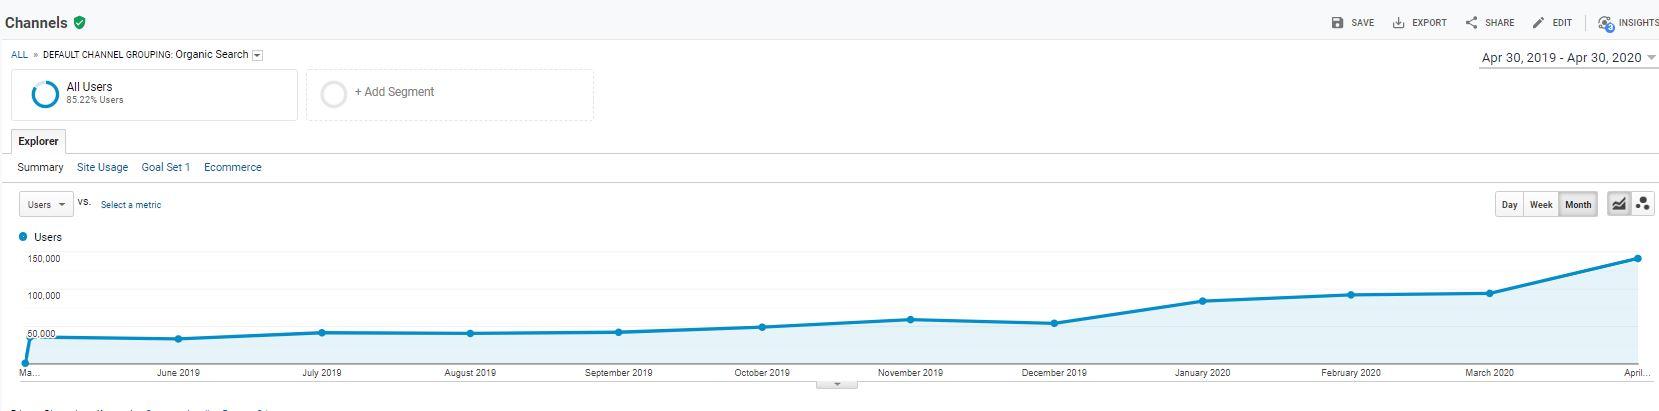 search engine traffic google analytics